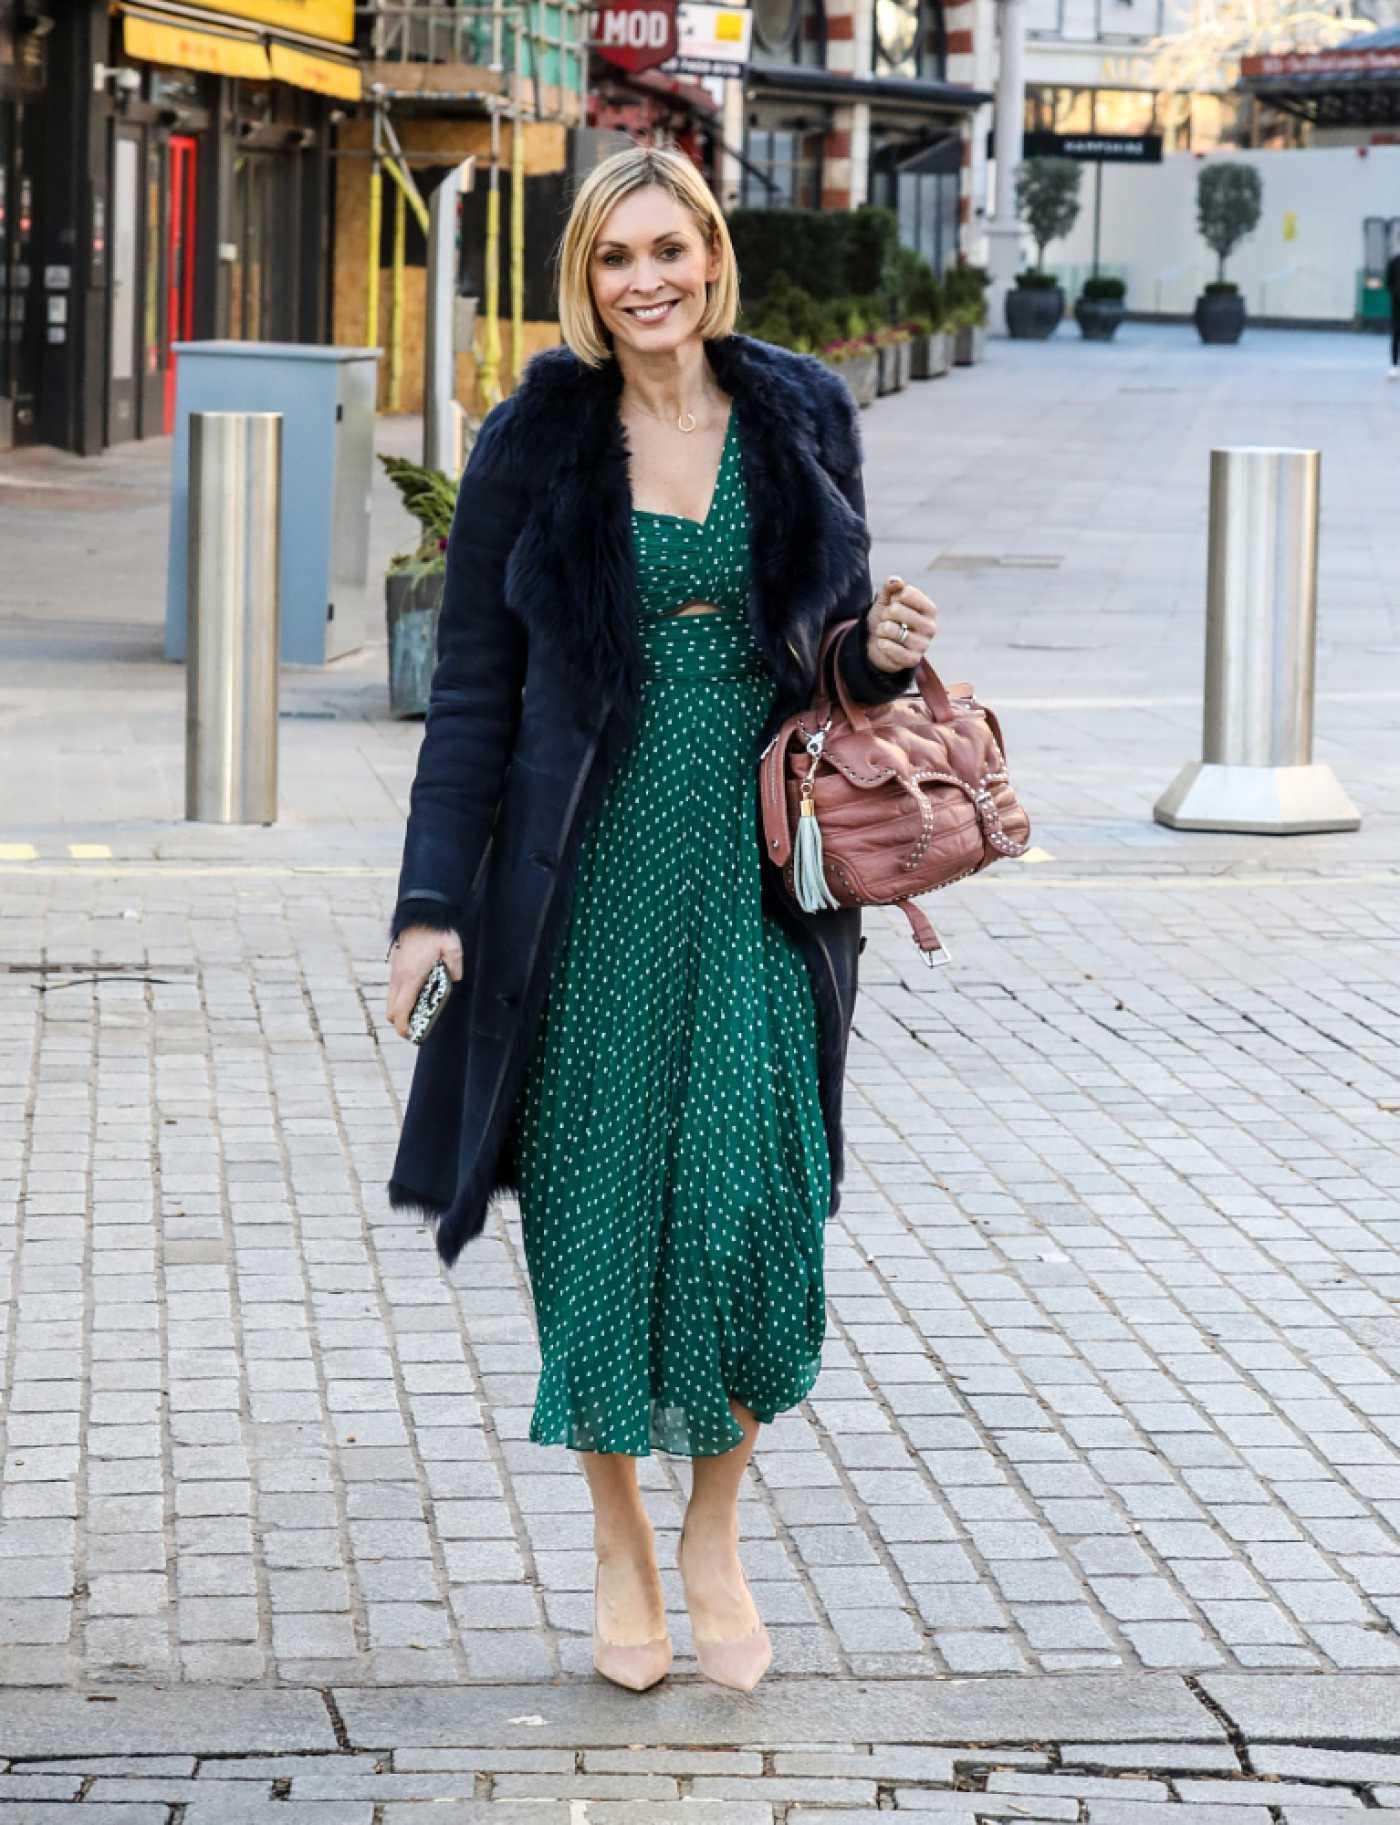 Jenni Falconer in Green Dress Leaves the Global Radio Studios in London 01/22/2021